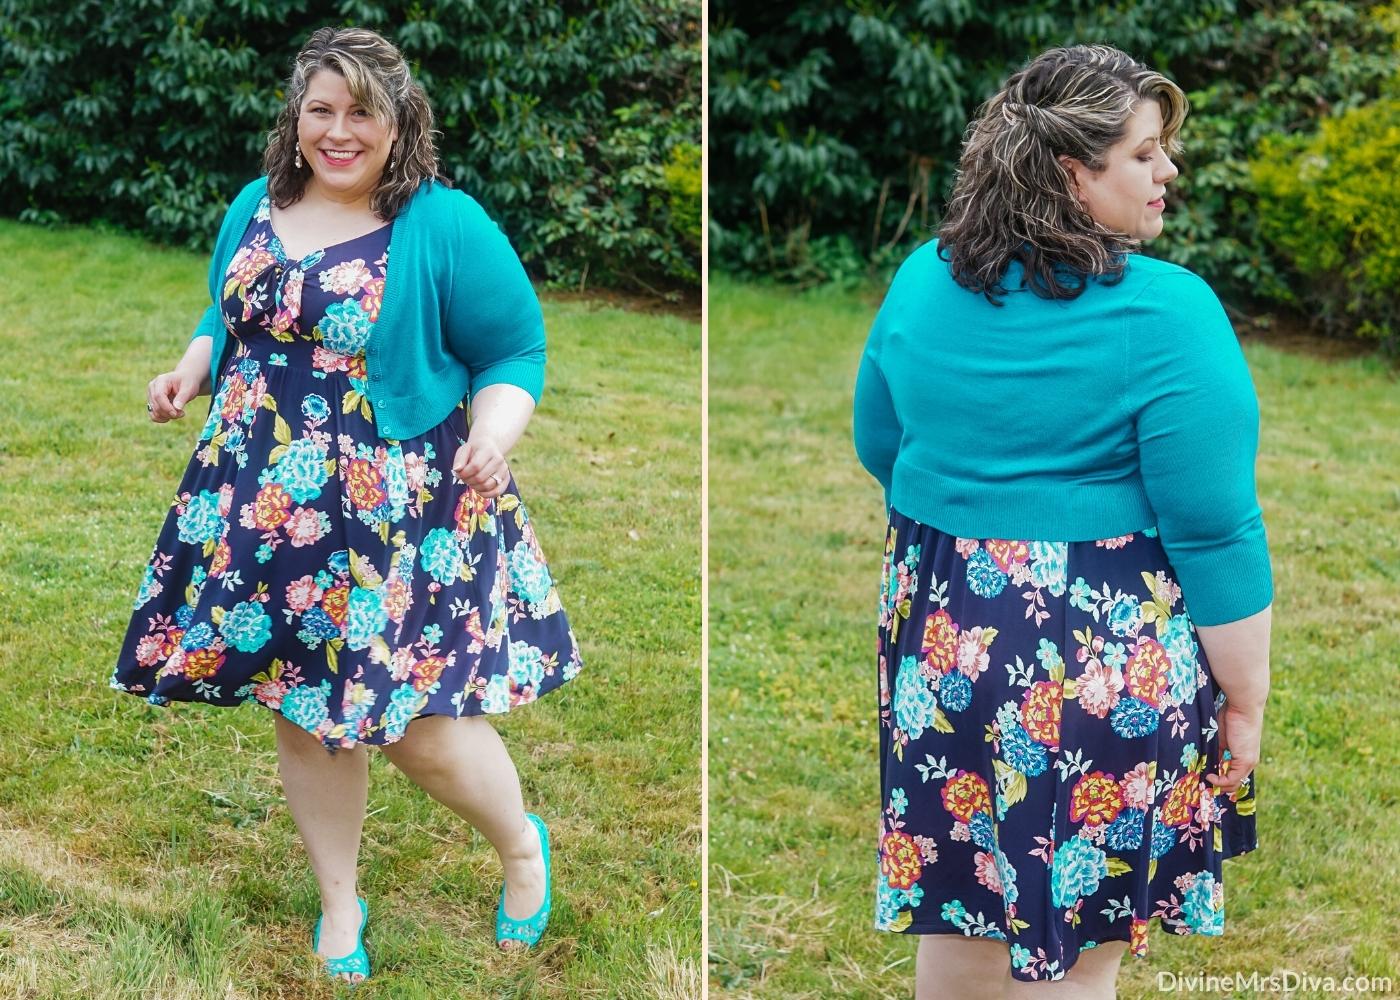 Reviewing Torrid's Blue Floral Super Soft Tie-Front Skater Dress -  DivineMrsDiva.com #psblogger #plussize #styleblogger #plussizeblogger #plussizefashion #psootd #ootd #plussizeclothing #outfit #style #40style #40plusblogger #Torrid